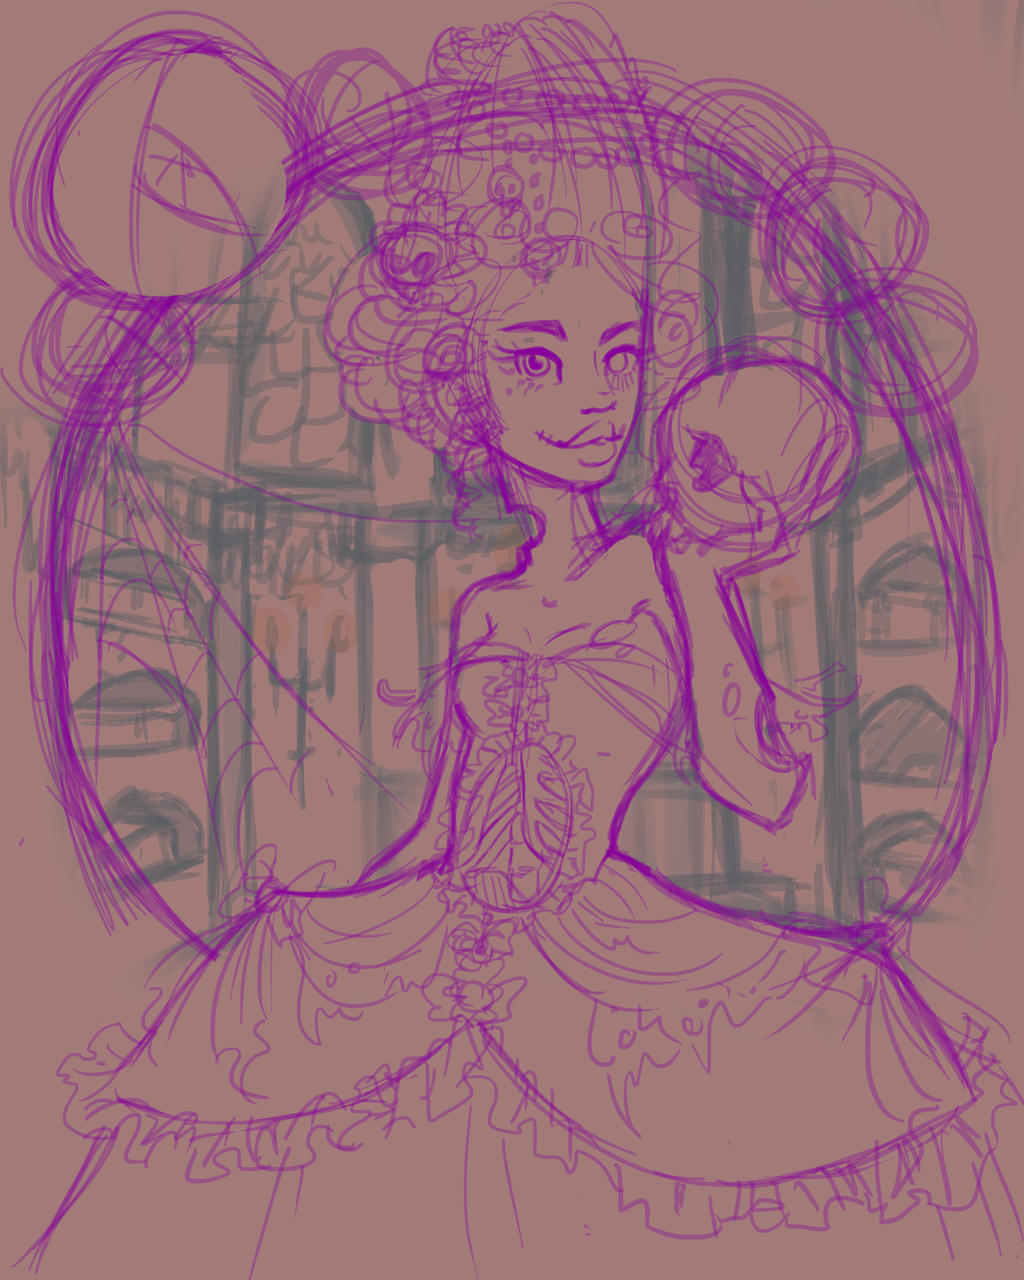 Adelaide The Zombie Princess by KalopsiaCreation